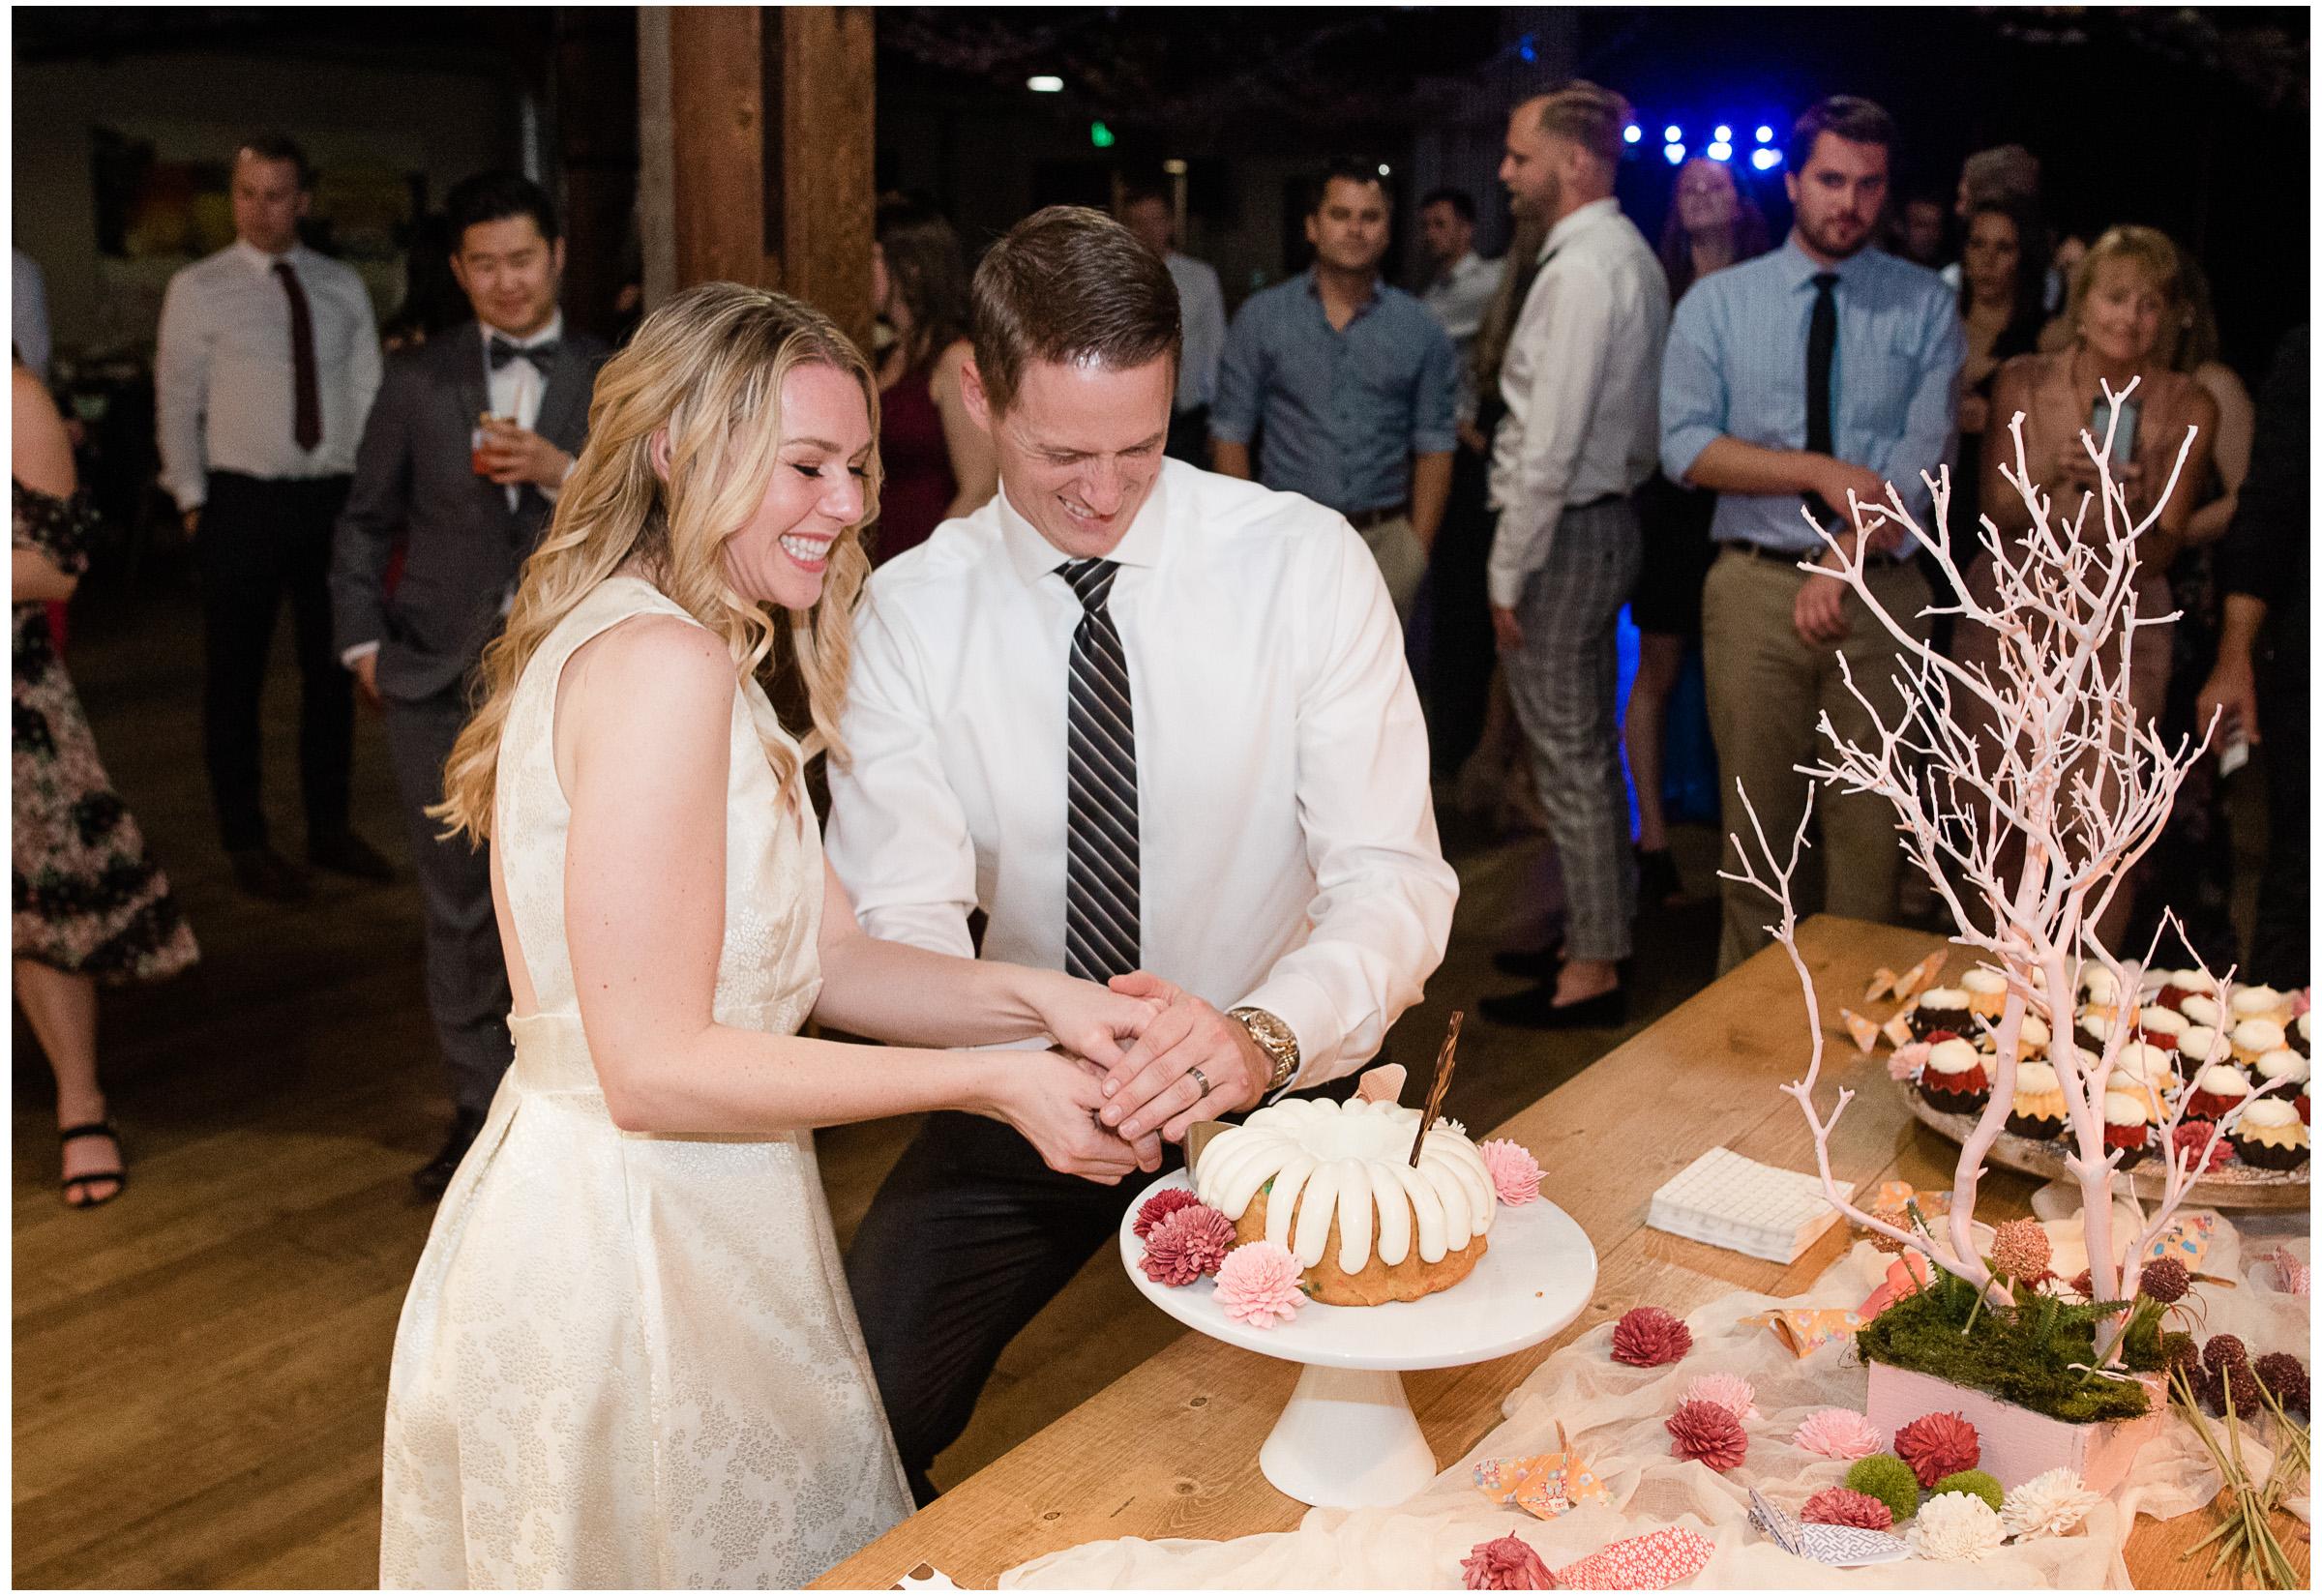 Loomis Wedding - Sacramento Photographer - Blue Goose - Justin Wilcox Photography - 21.jpg